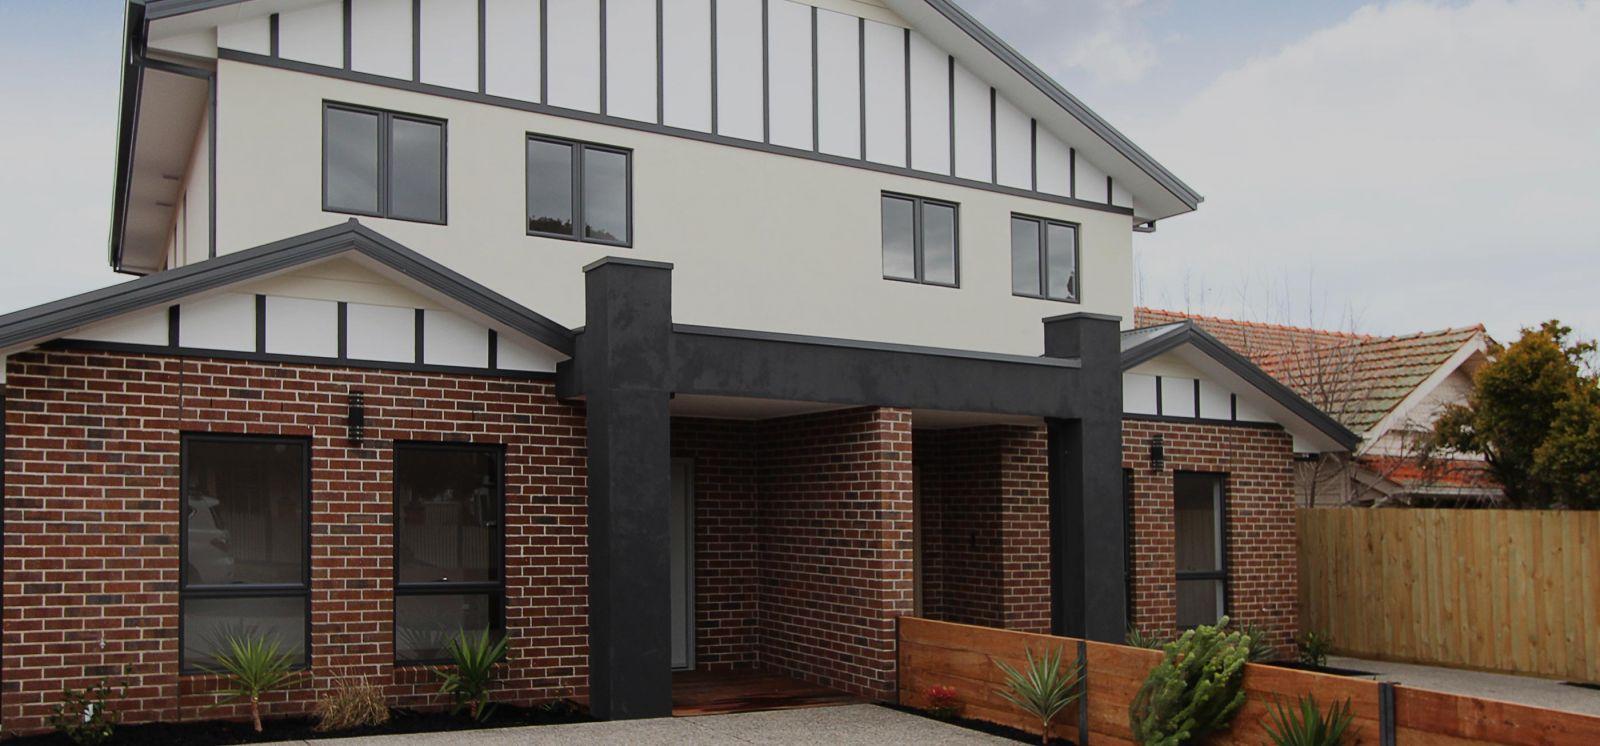 Dual Occupancy Home Design